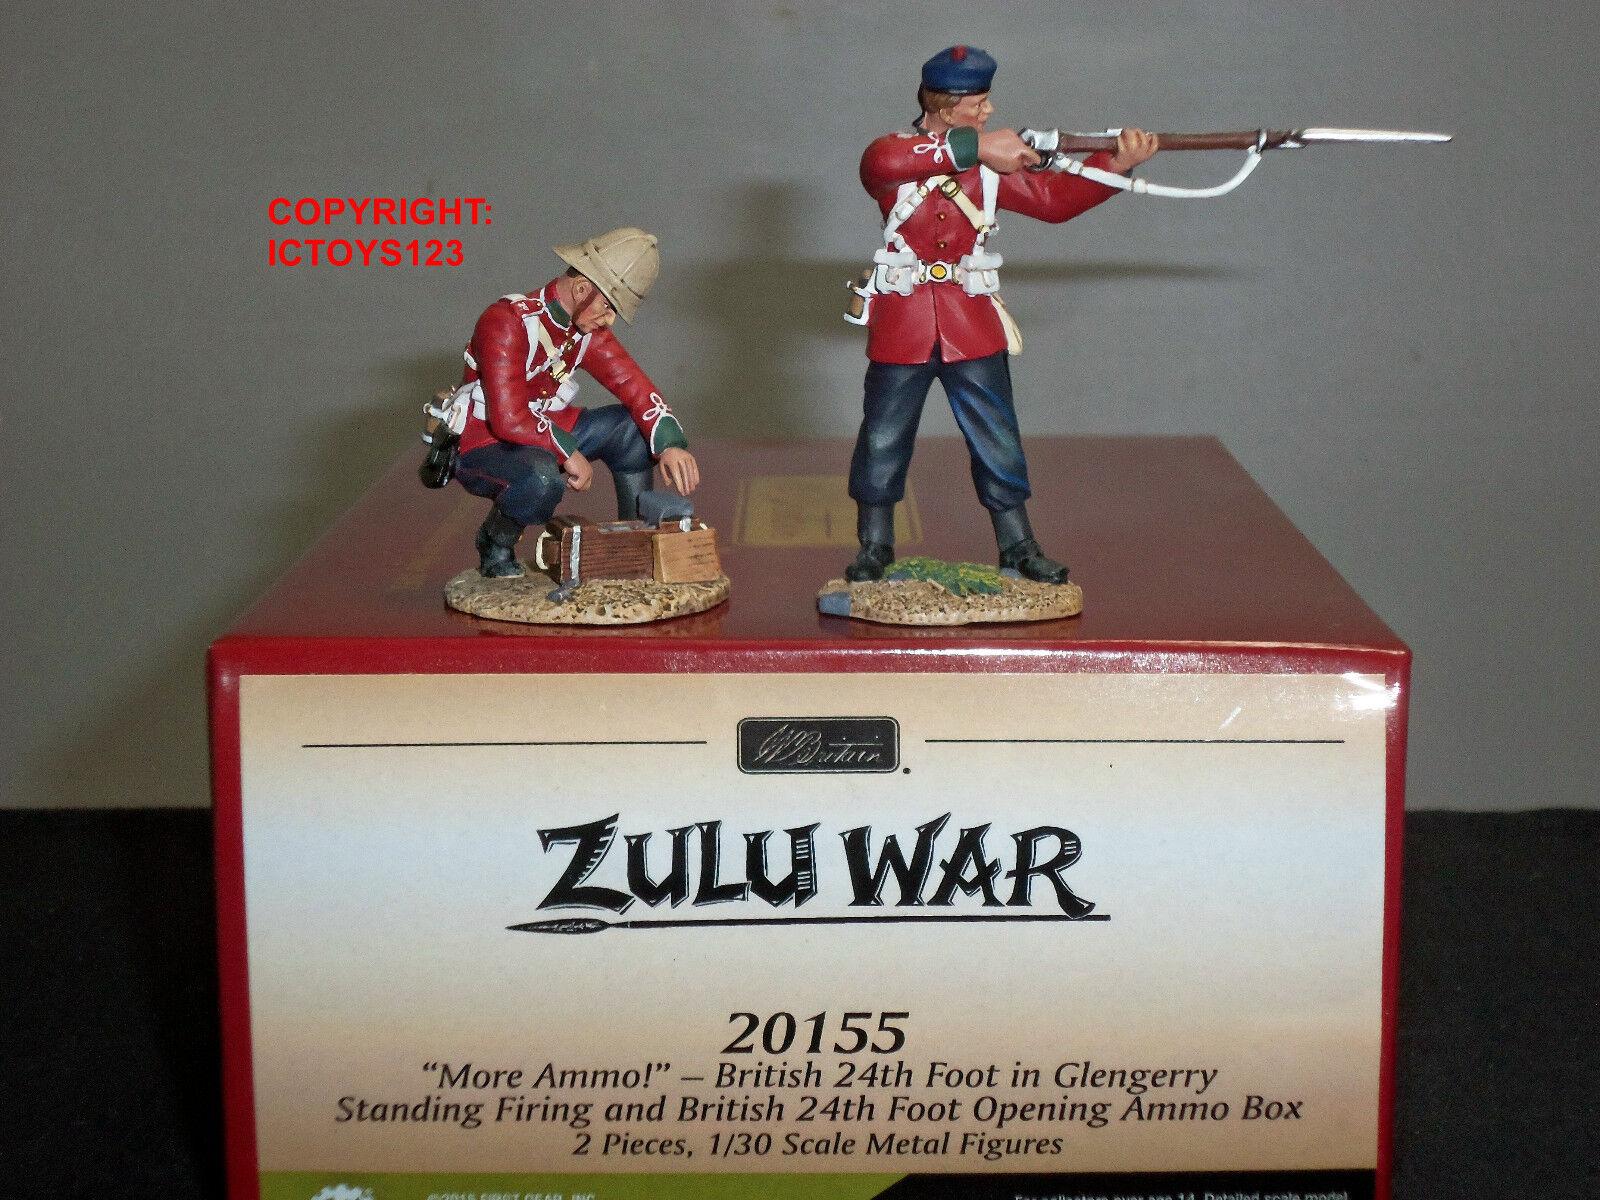 BRITAINS 20155 ZULU WAR   MORE AMMO   BRITISH 24TH FOOT IN GLENGARRY + AMMO BOX